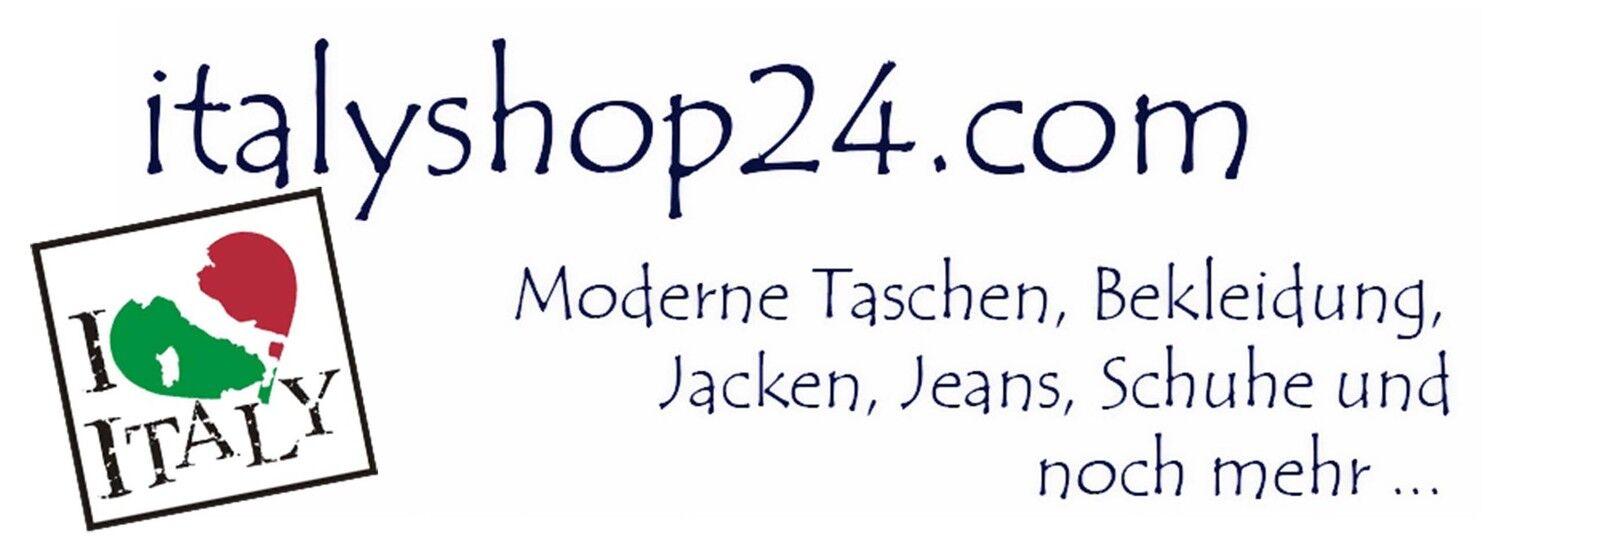 Italyshop24.com